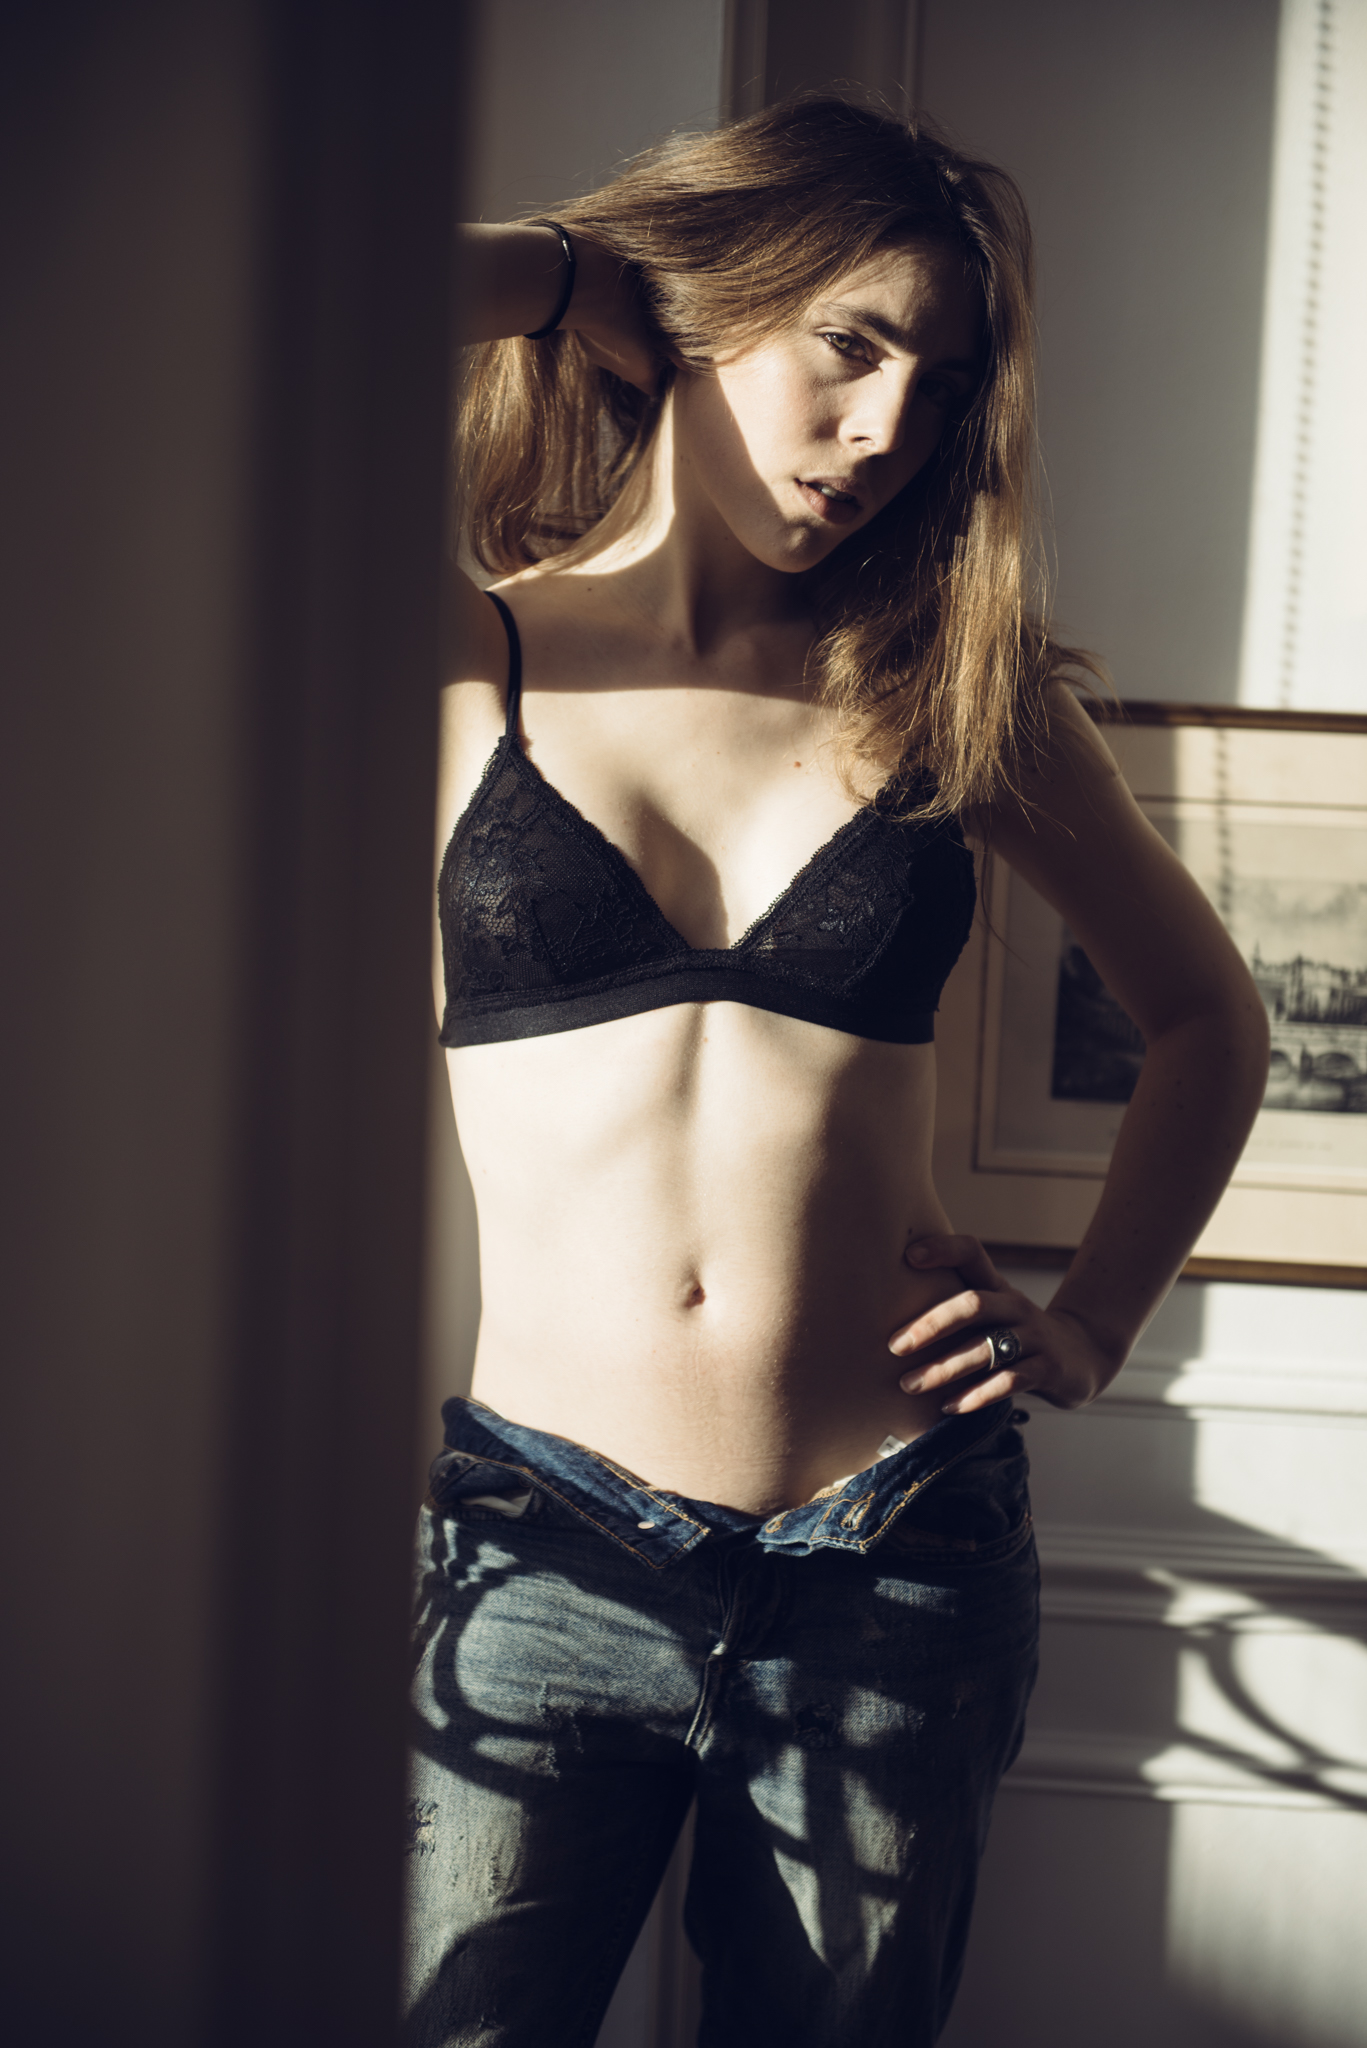 CelineB_brut_3985